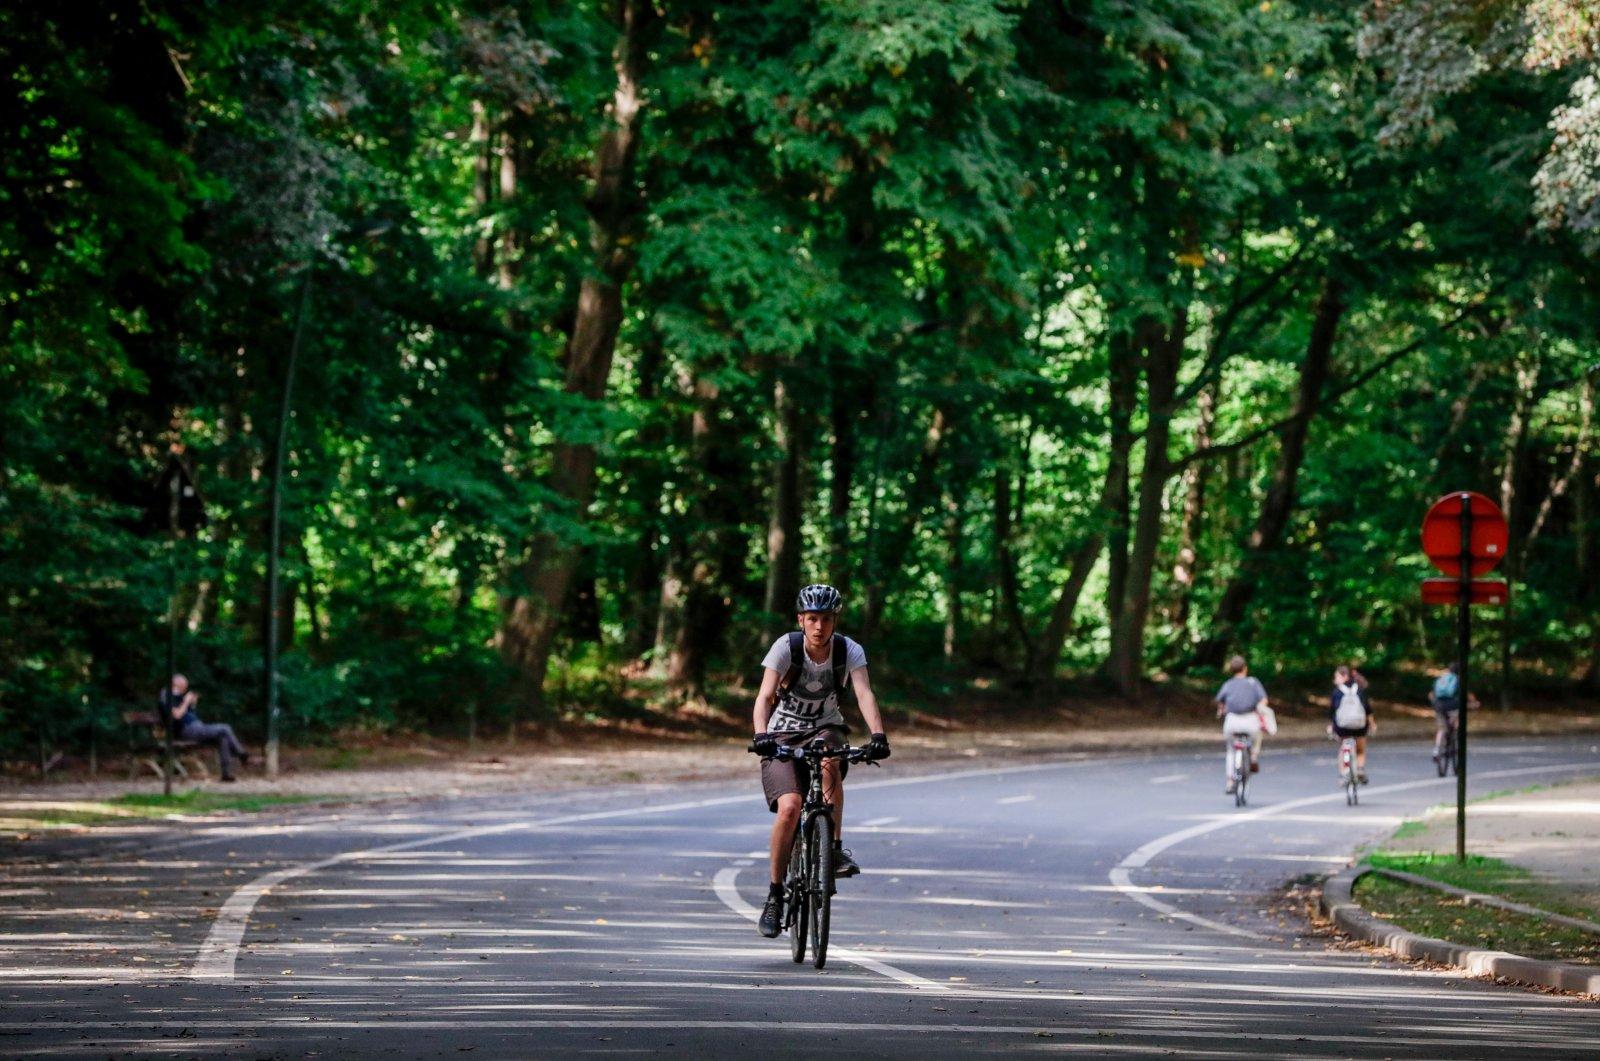 A man rides a bike in the Bois de La Cambre in Brussels, Belgium, Sept. 7, 2020. (EPA Photo)